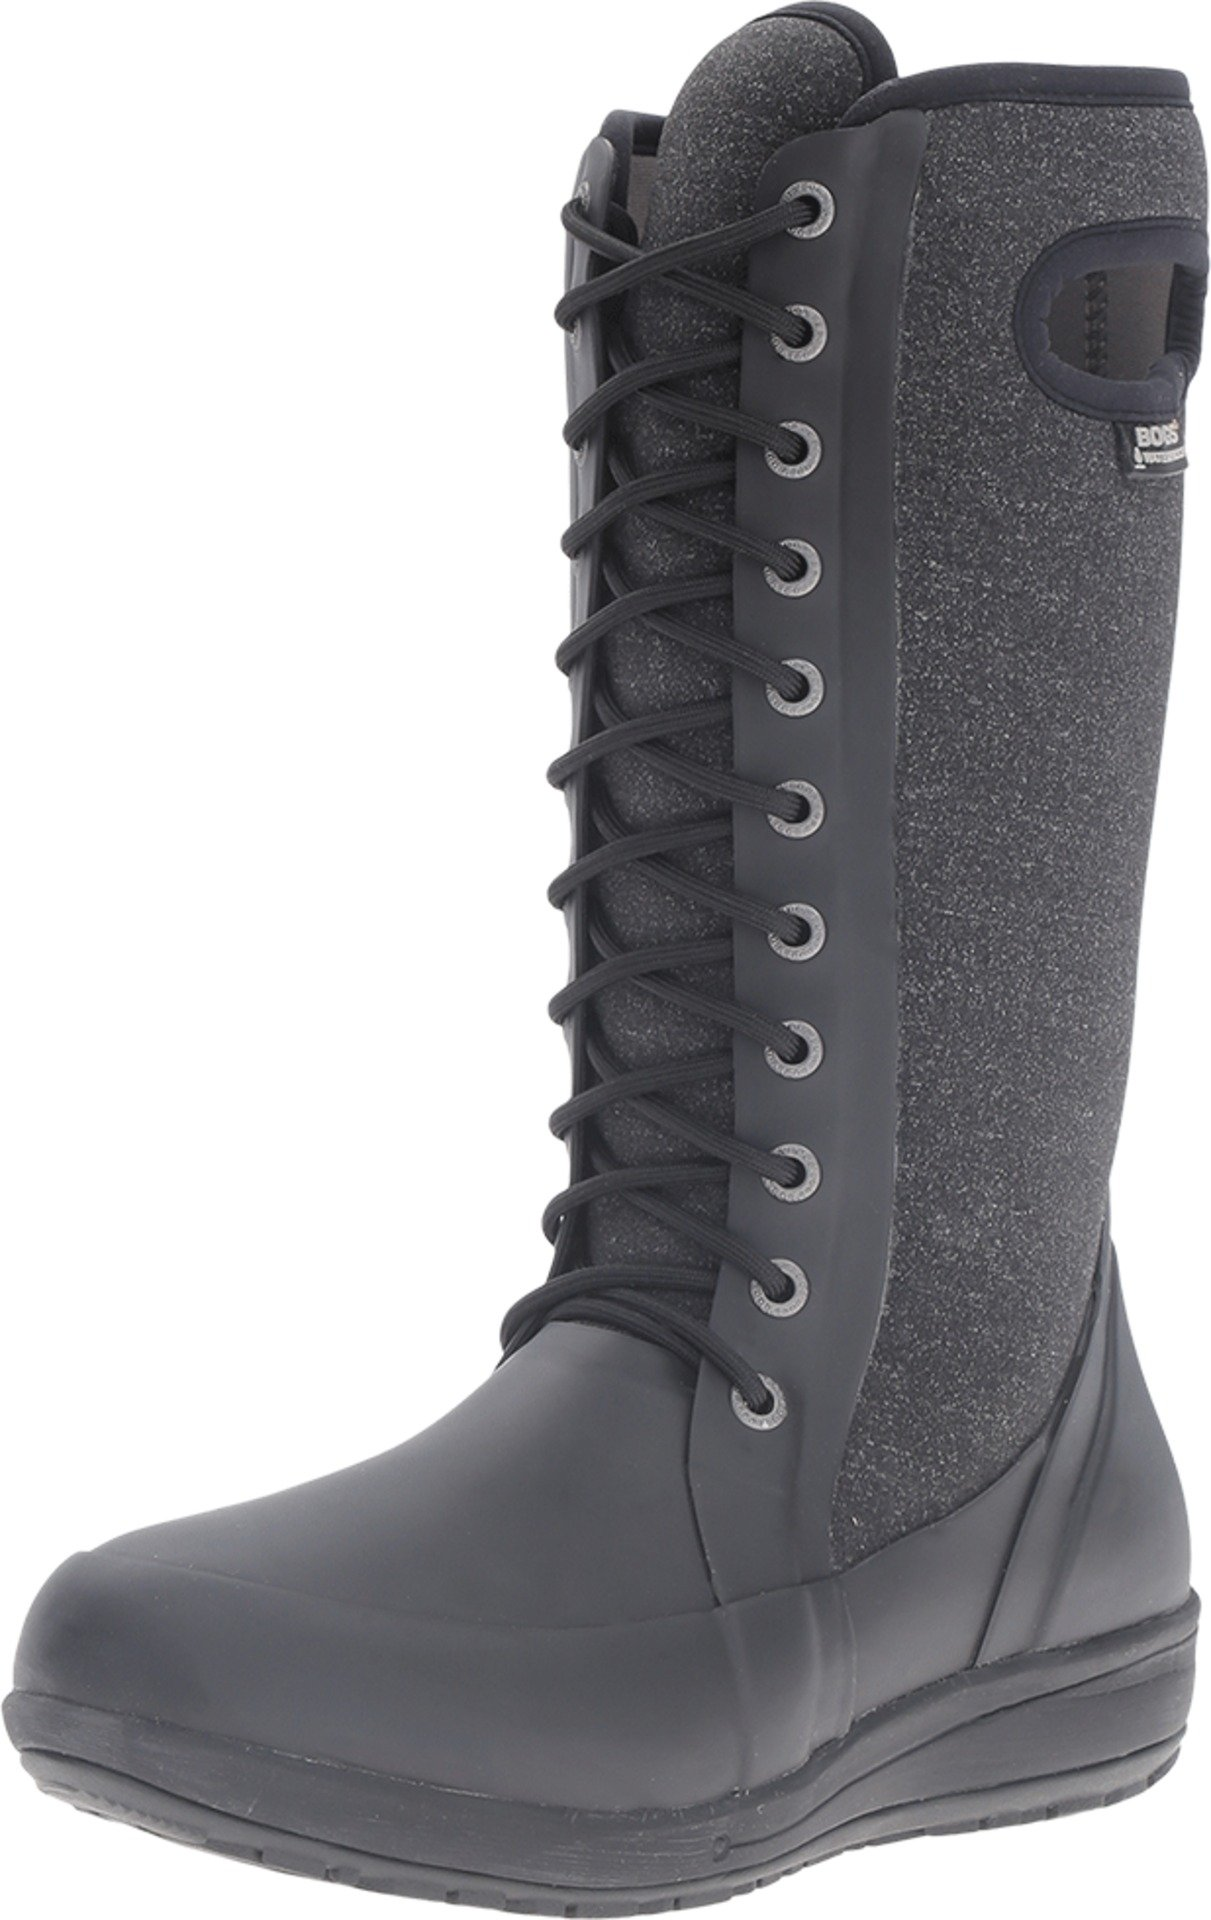 Bogs Women's Cami Lace Tall Melange Waterproof Winter Boot Blk Mlti 8 M US